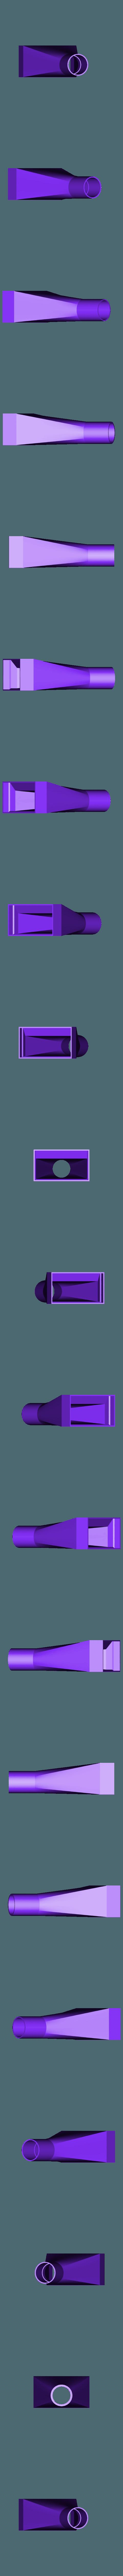 Part-Teil 07 Tube adapter - Rohradapter.stl Download free STL file BBQ Fan Extension for Gearbox 256 / Grillgebläse Erweiterung für Getriebe 256 • 3D print design, CONSTRUCTeR